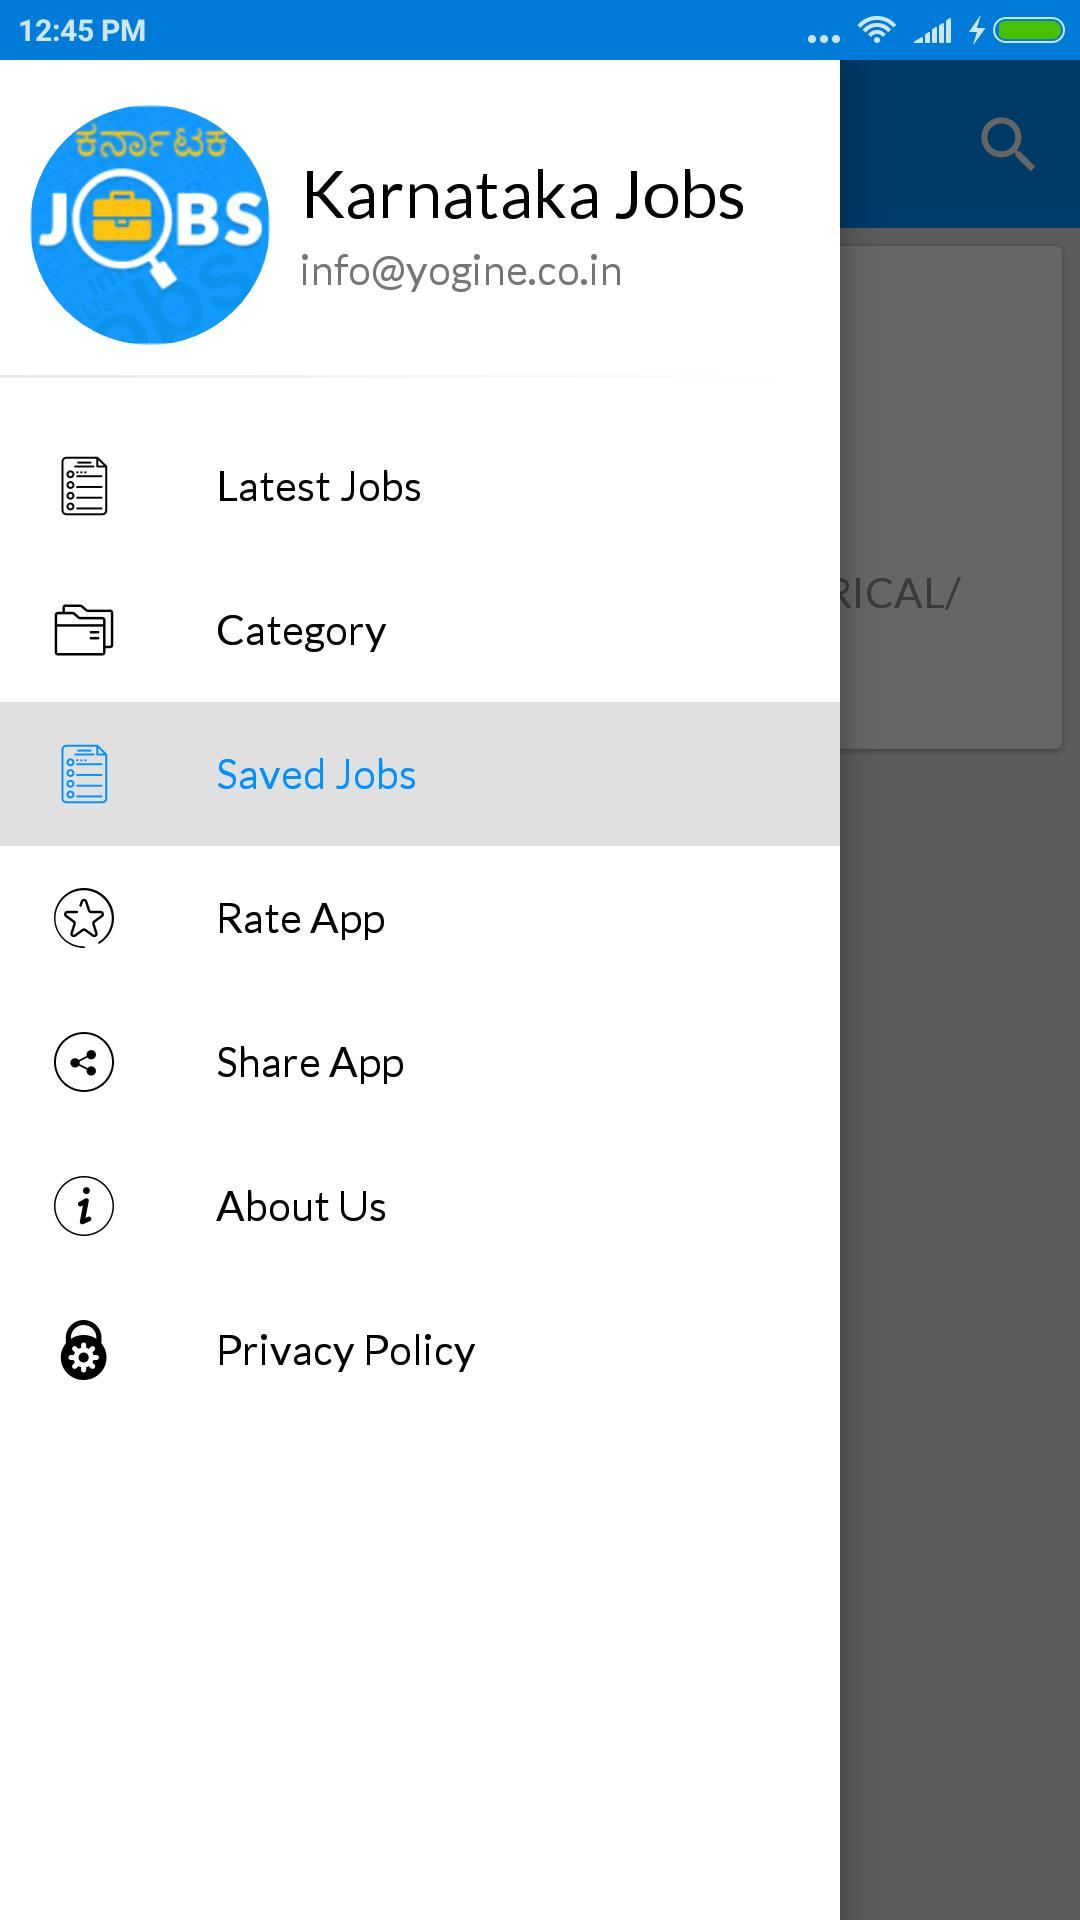 Sarkari naukri govt jobs : Jobs Search for Android - APK